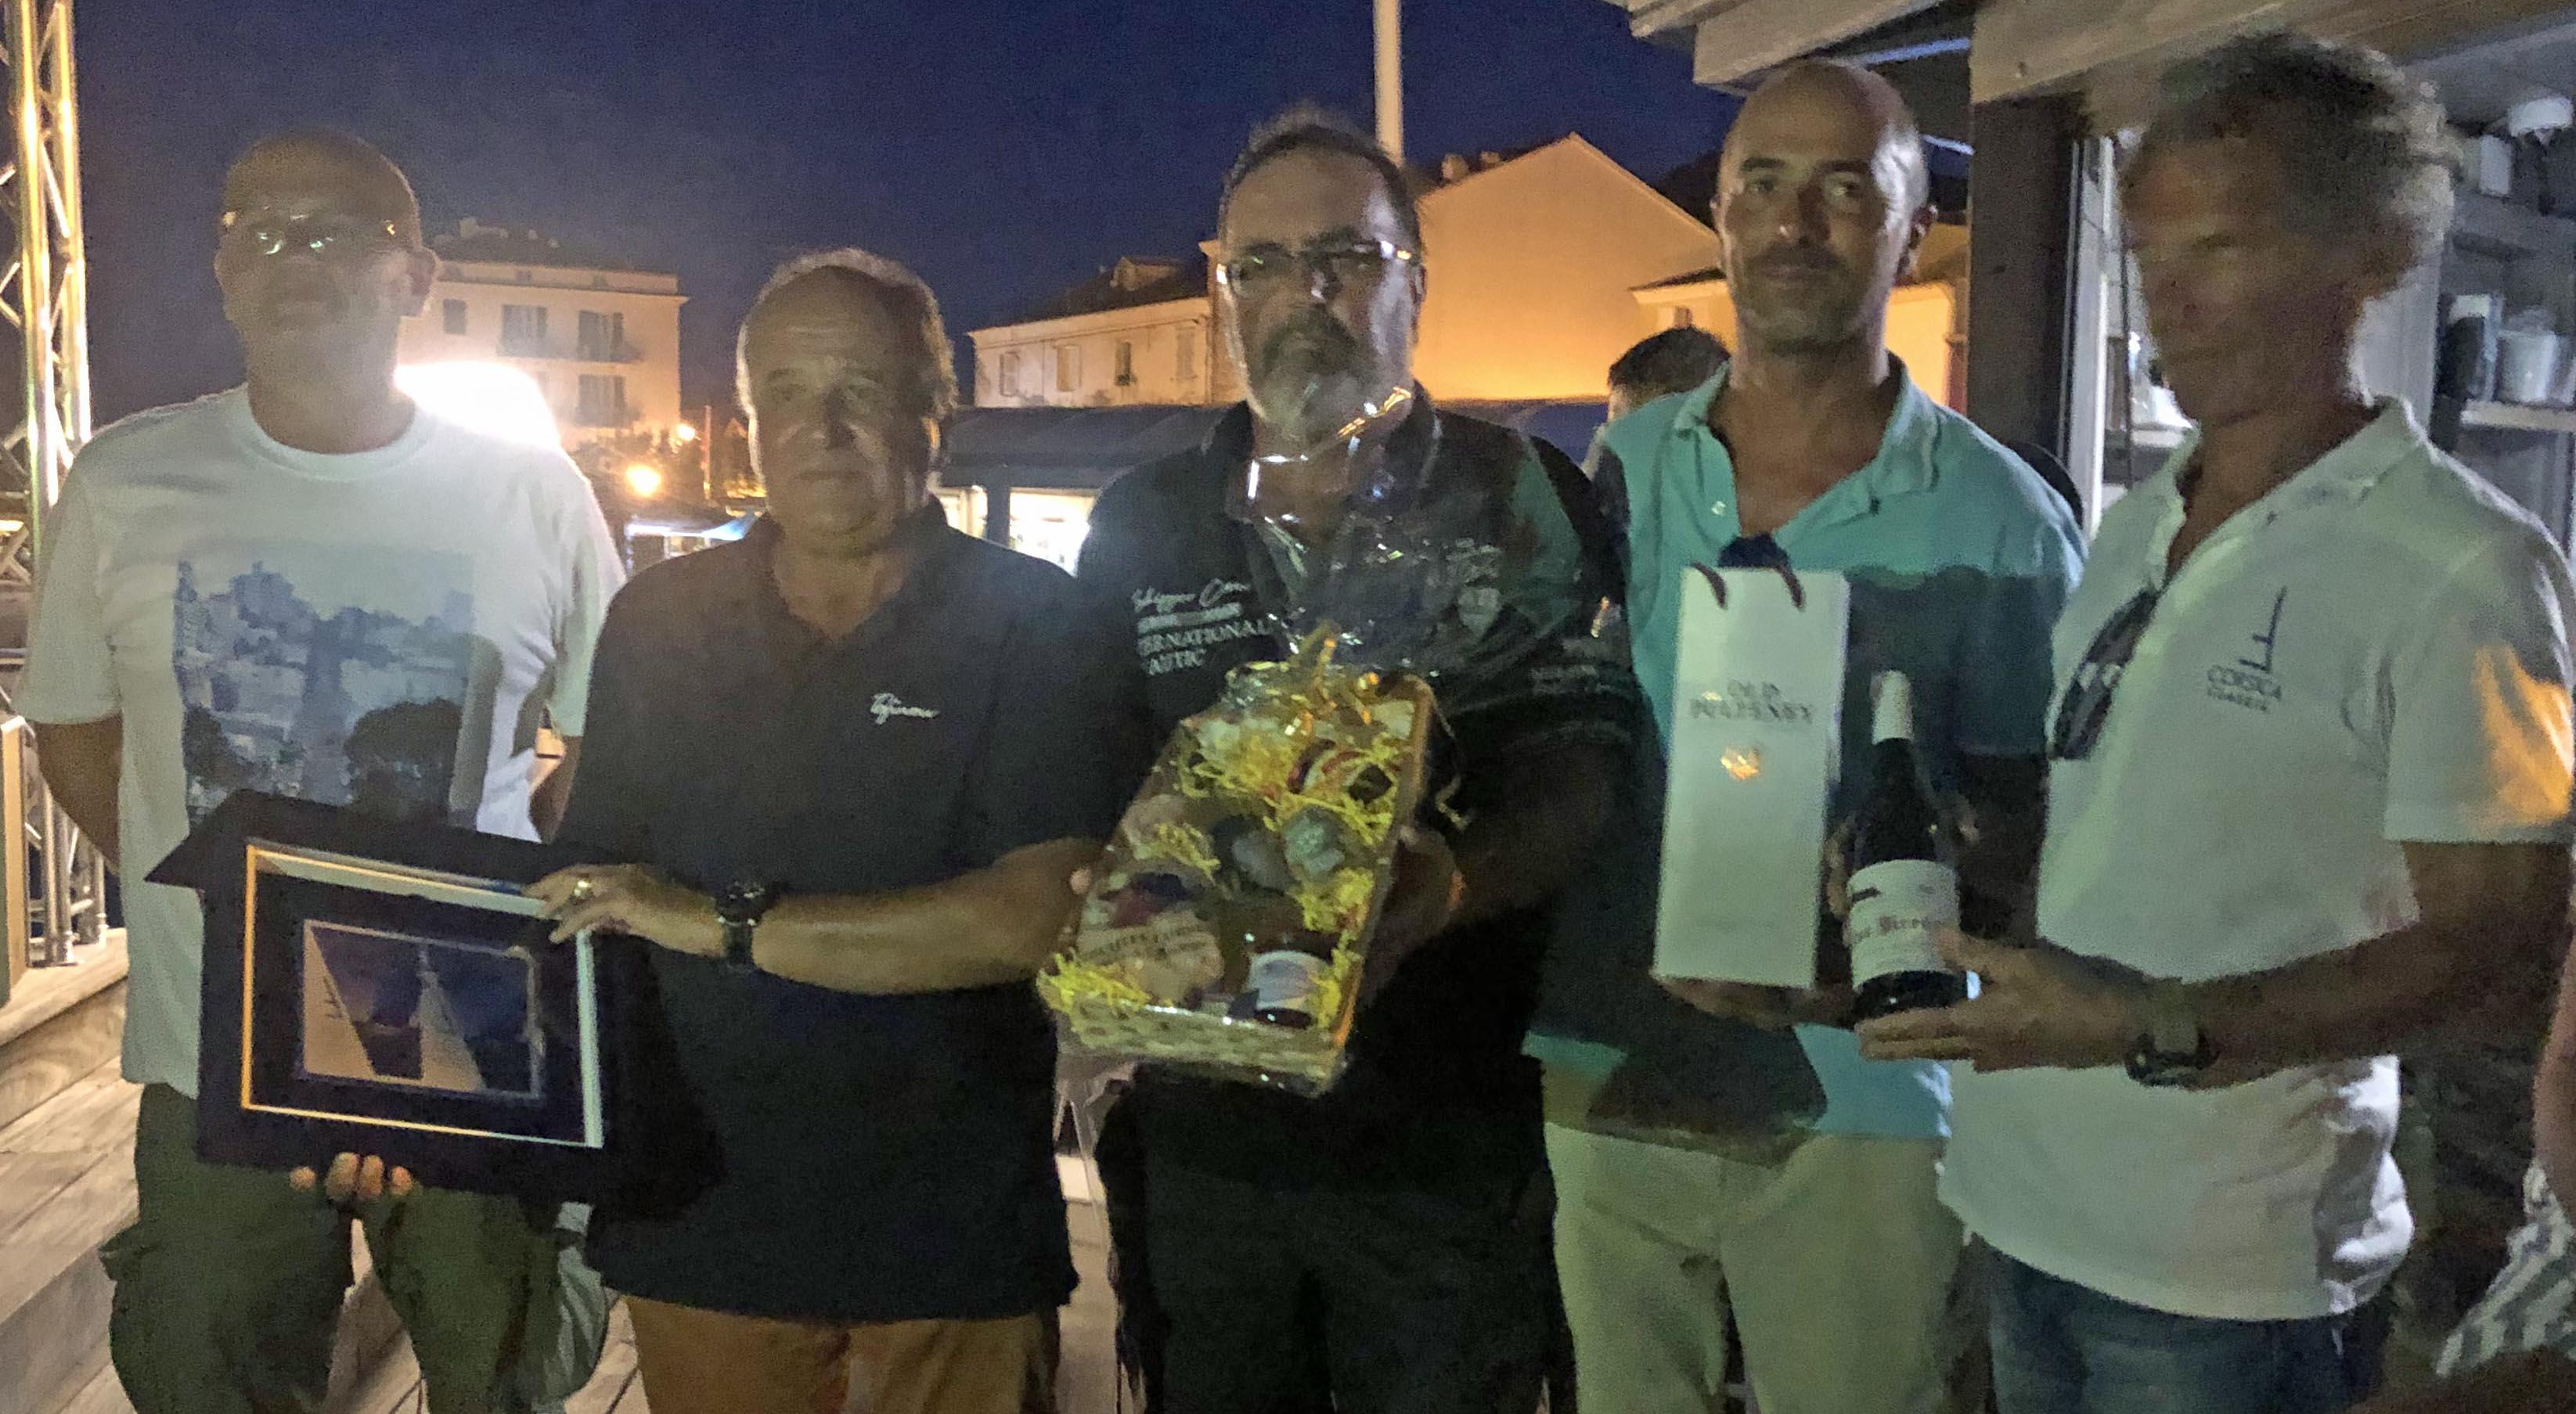 CC 2019 SY Hounbonne IV remise de prix  Macinaggio vendredi 30 août photo Katia Kulawick Assante DR